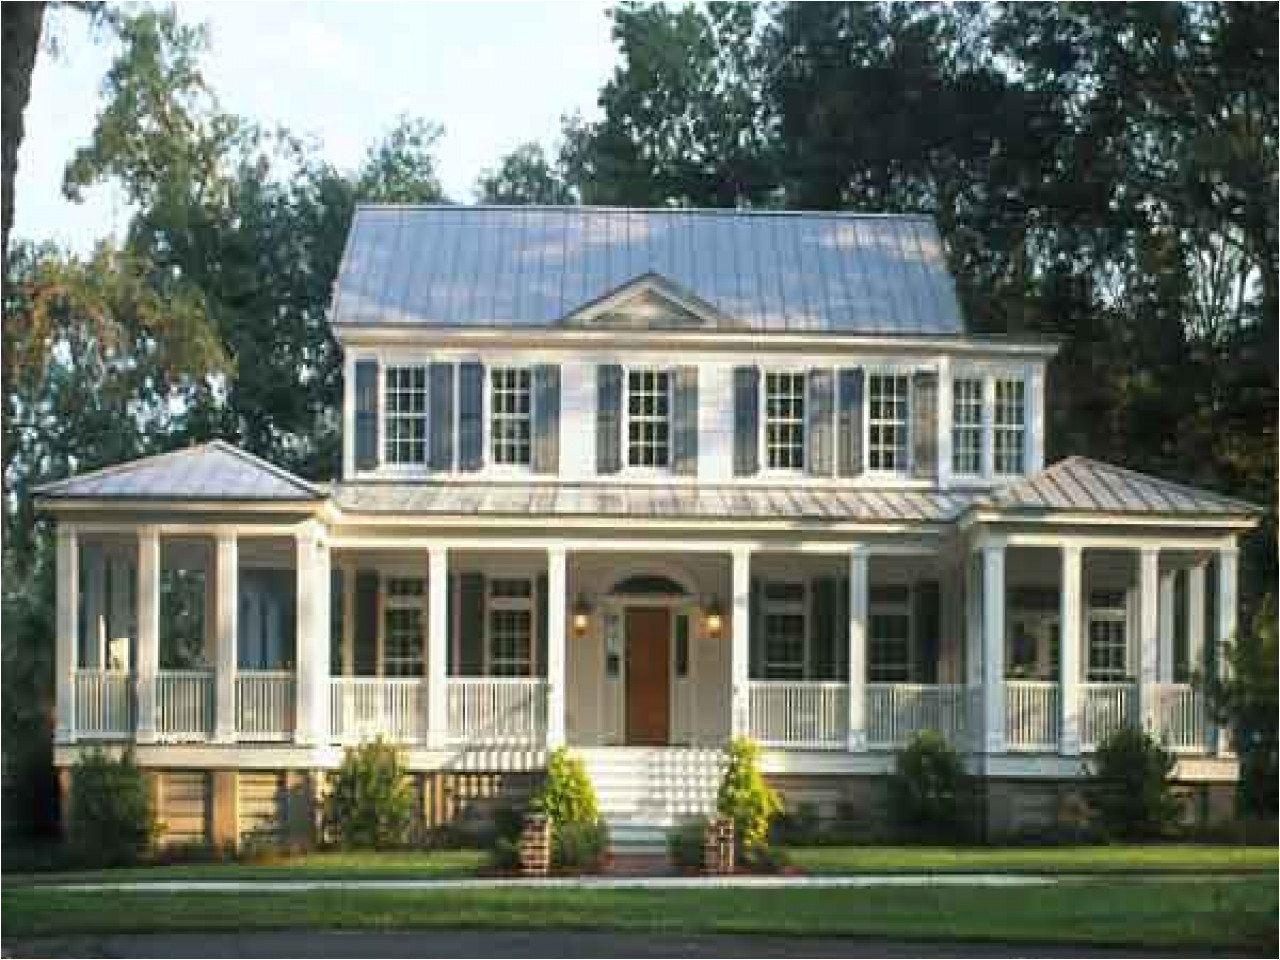 0627ecdd5c134032 house plans southern living magazine southern living house plans with porches